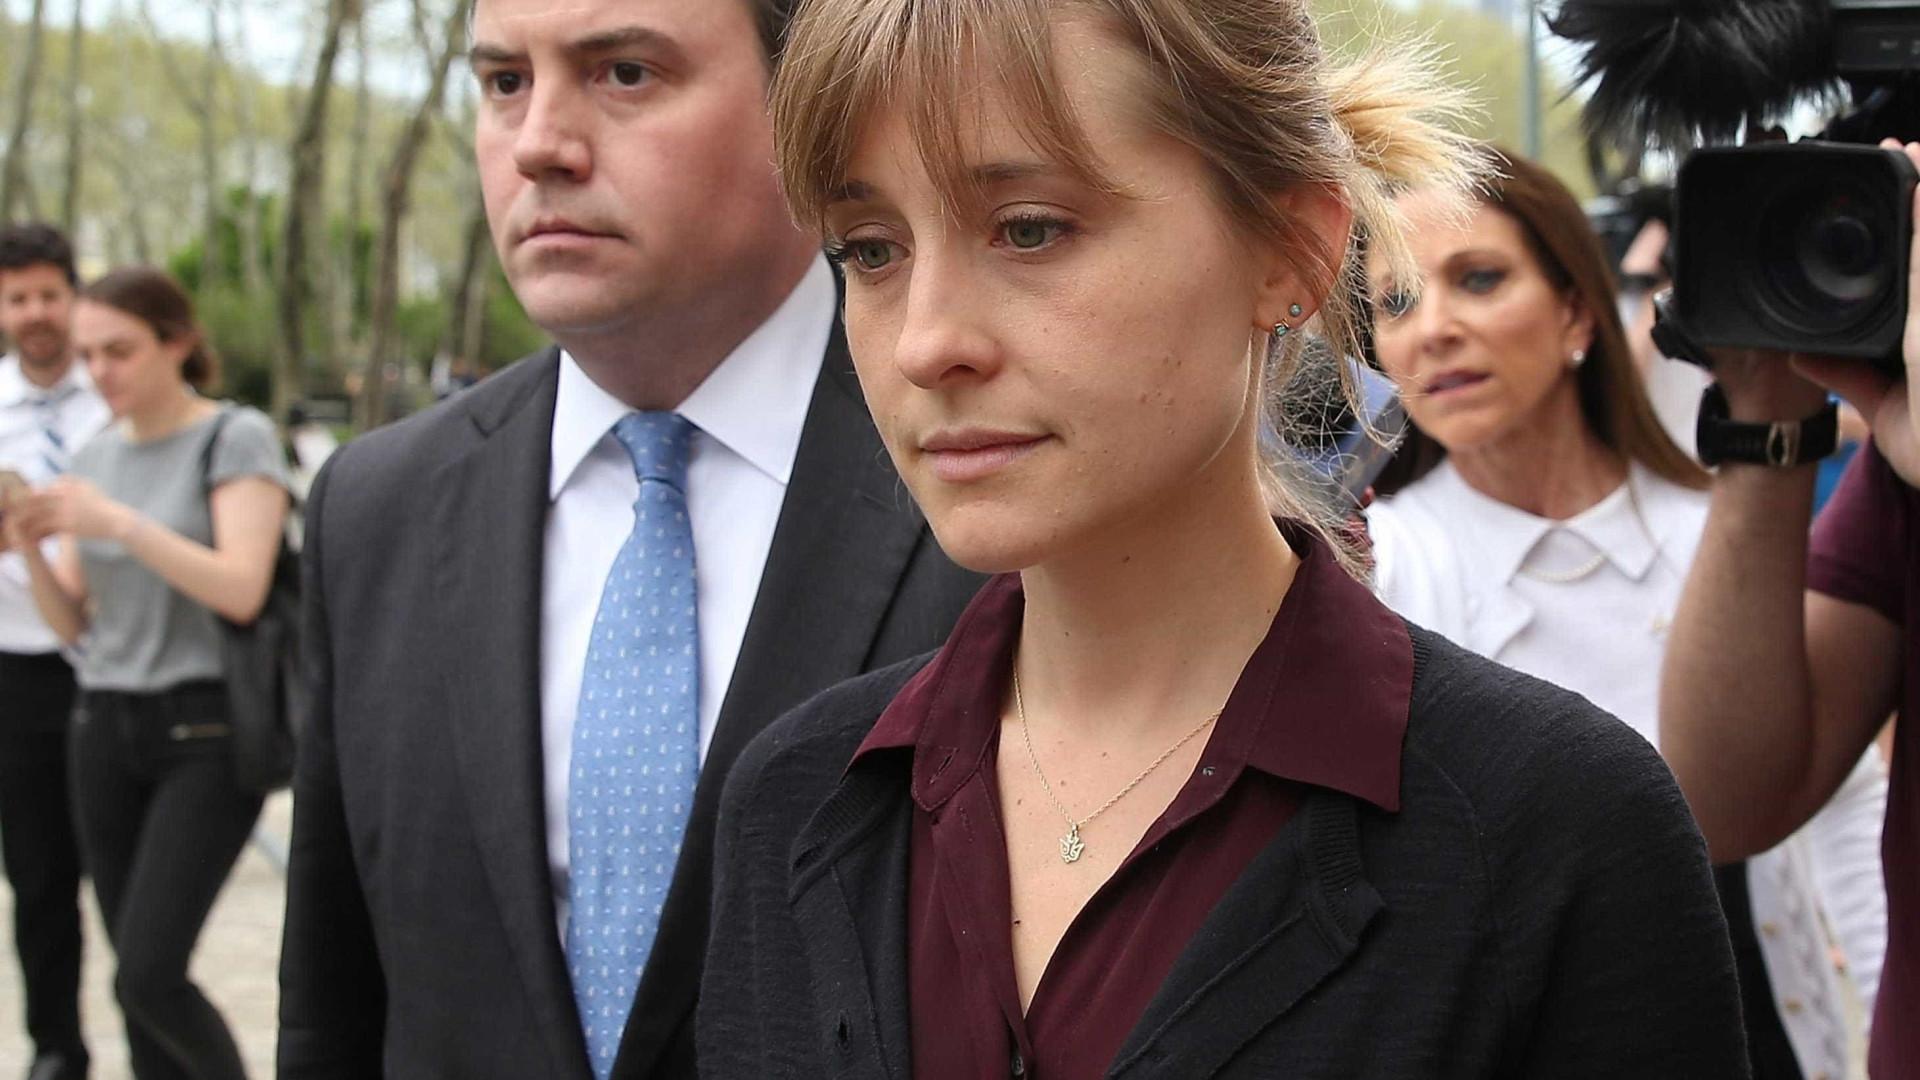 Justiça autoriza a atriz Allison Mack a estudar e frequentar igreja